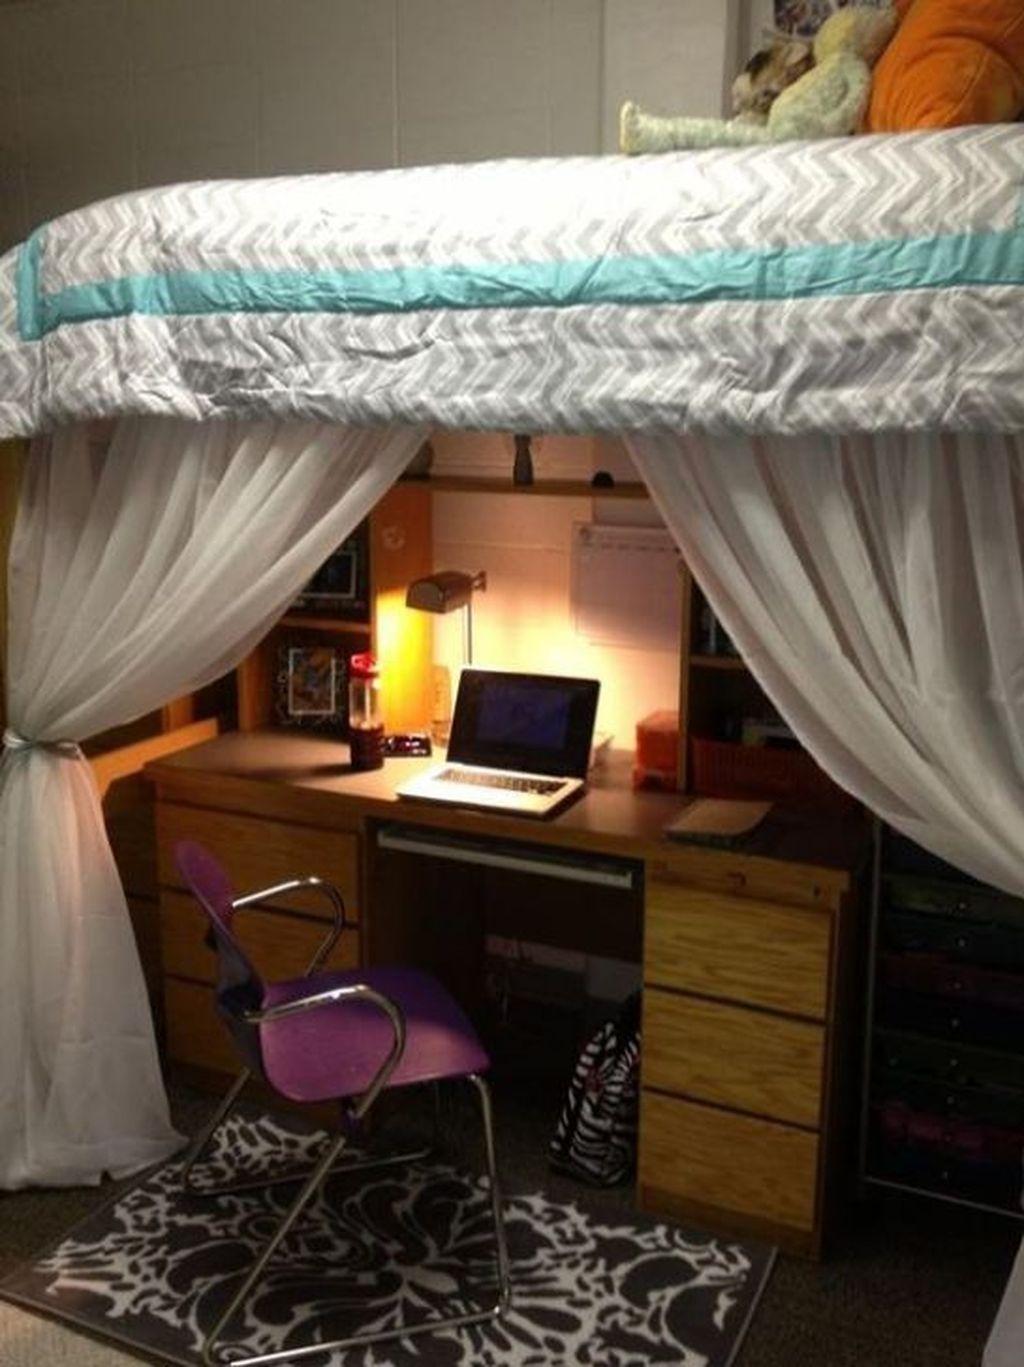 Efficient Dorm Room Organization Decor Ideas 01 Dorm